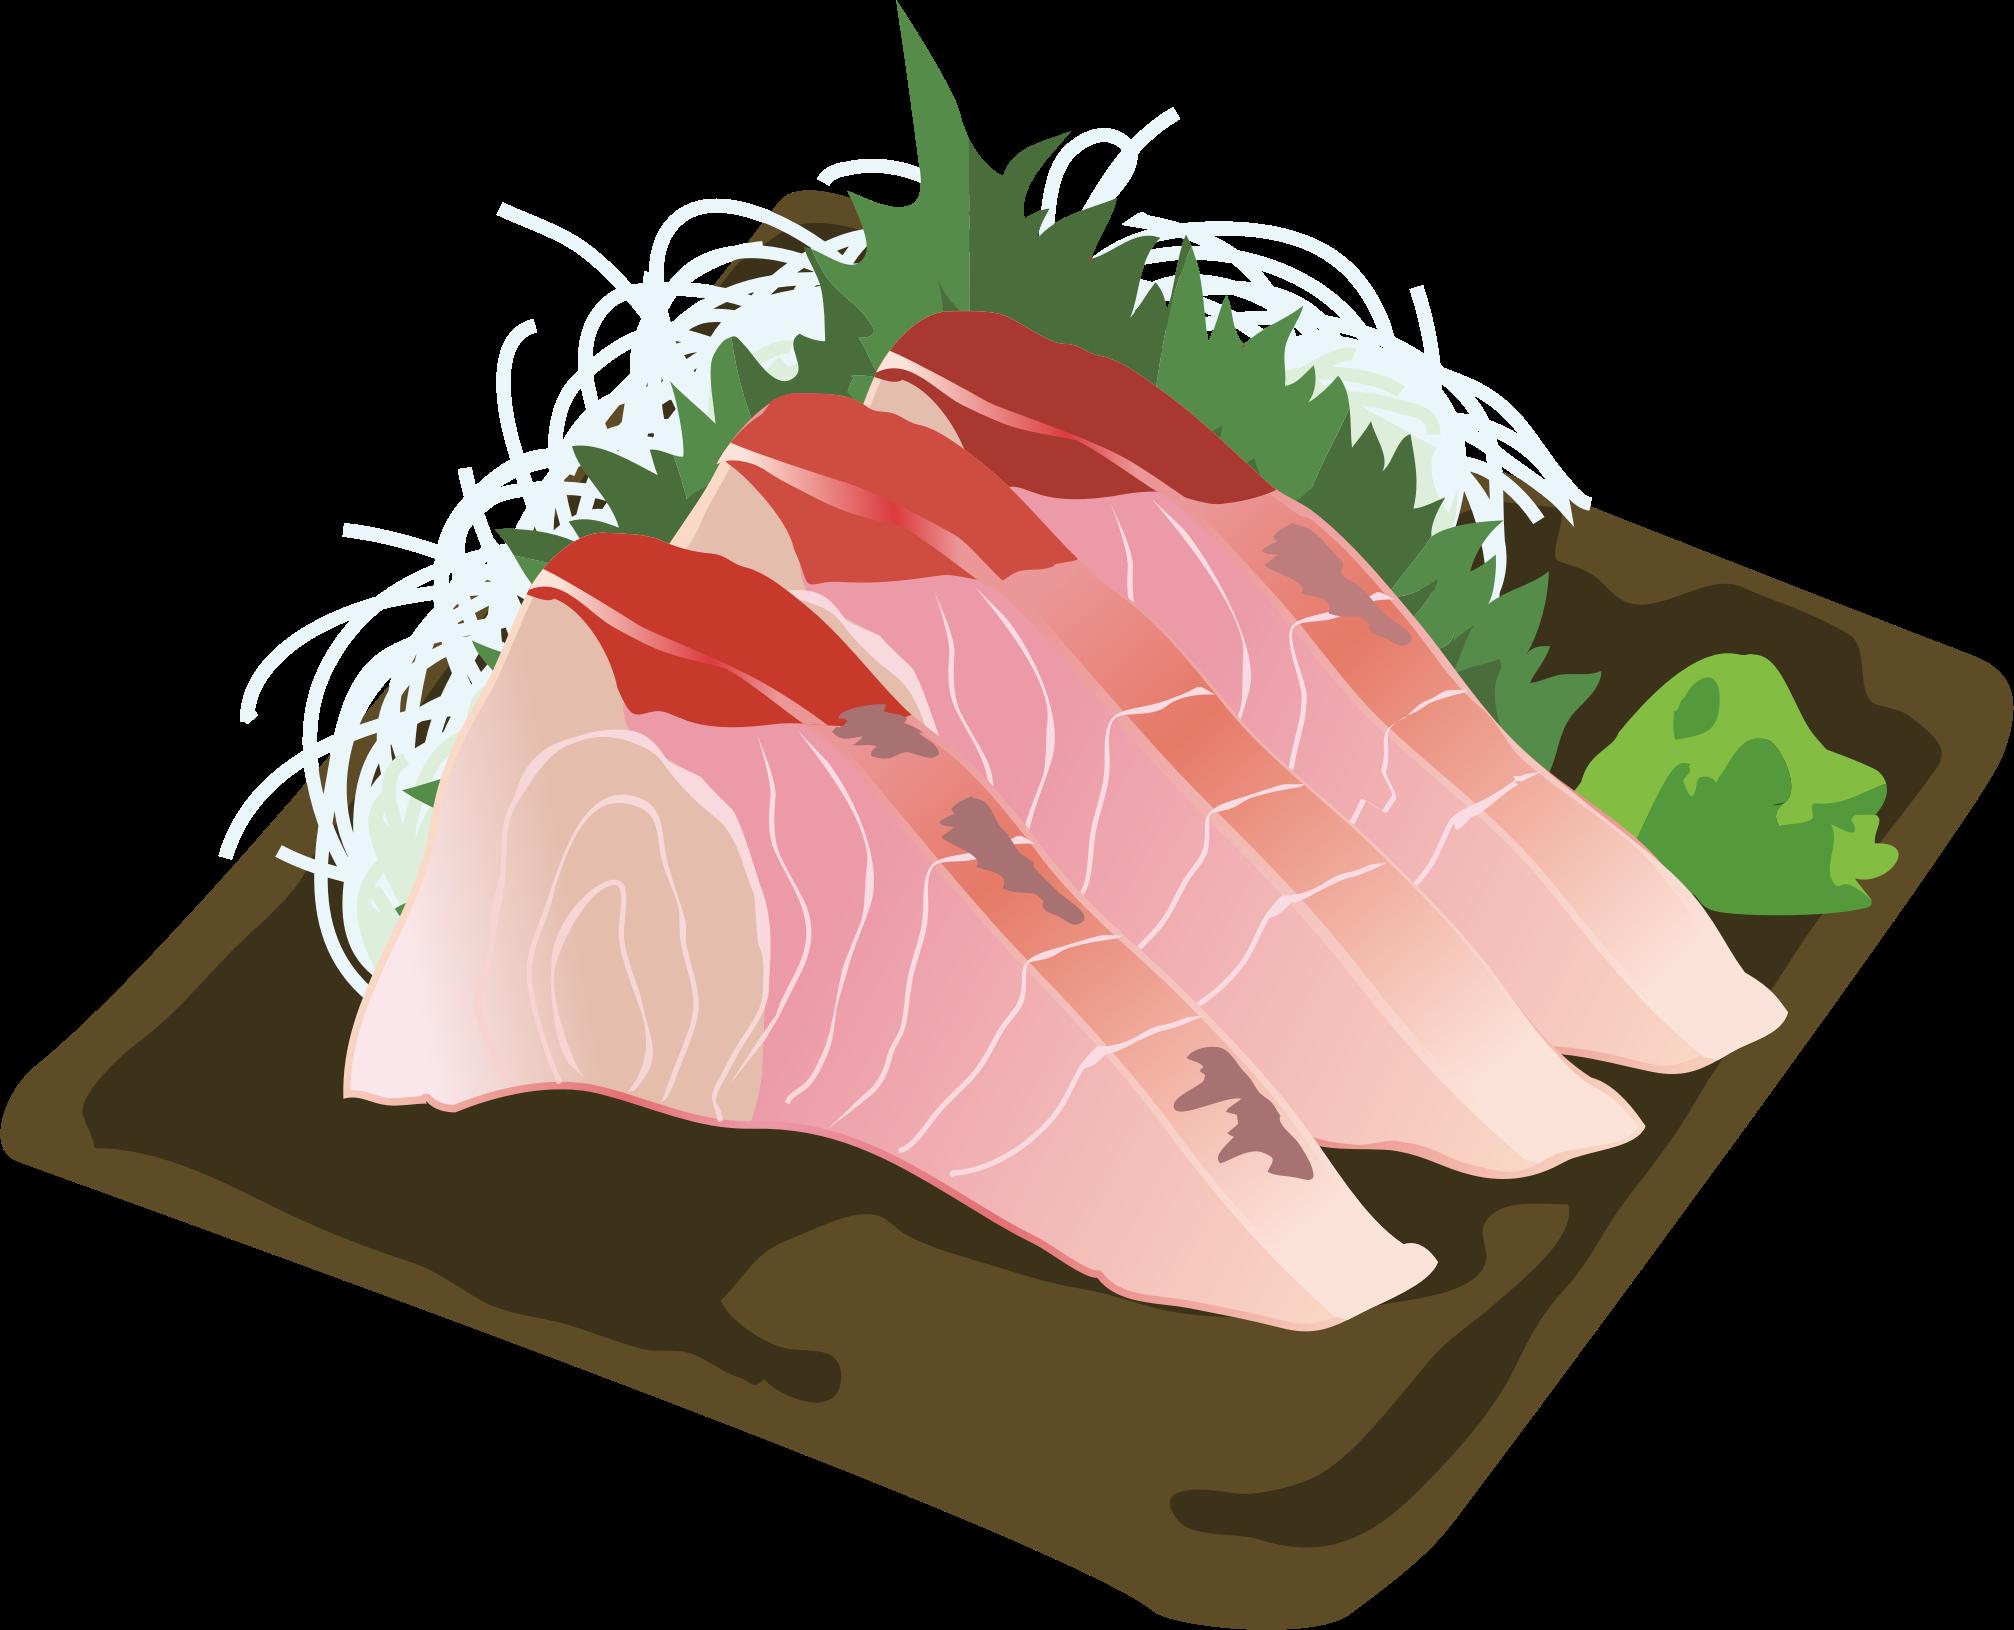 Sashimi icons png free. Tuna clipart amberjack